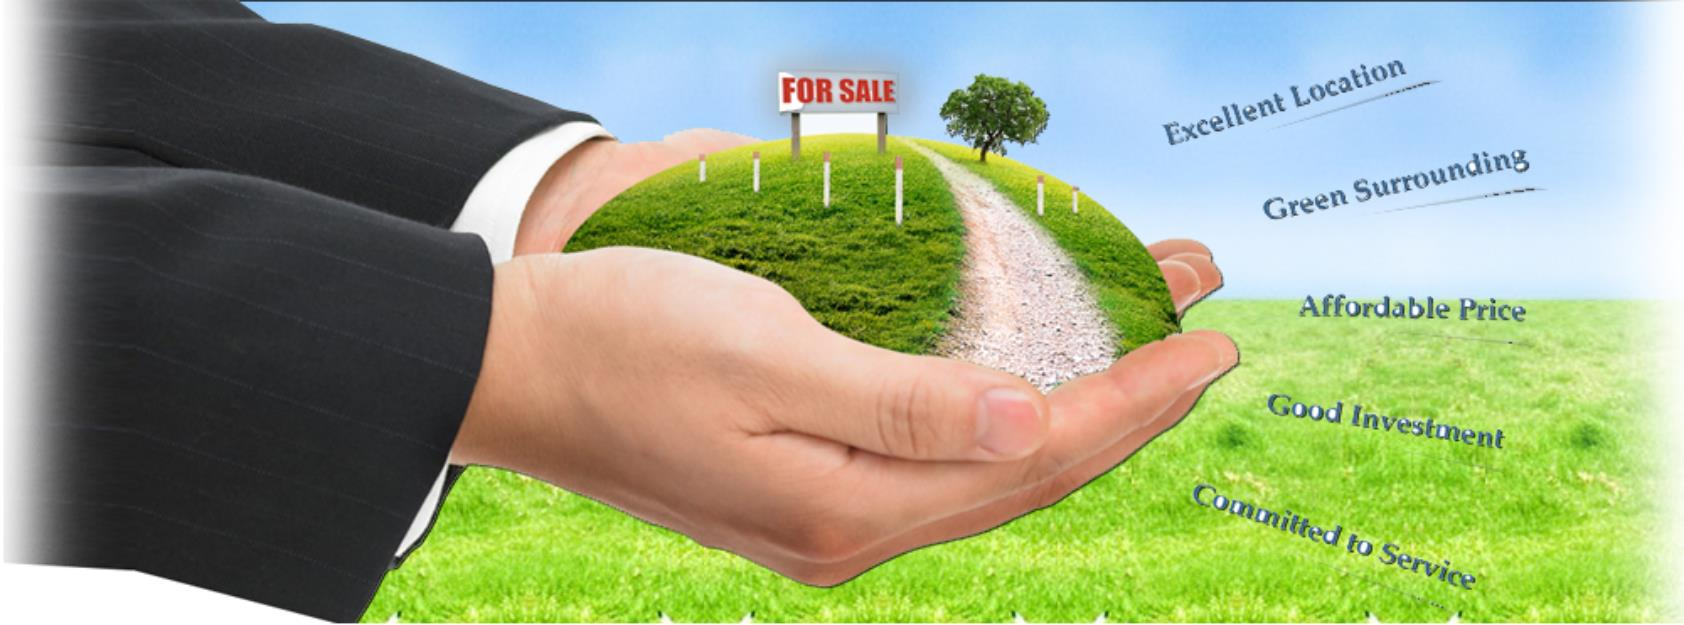 Residential Plot/Land Sales For in Sundharam nagar Extension,Thirupathi nagar,Medical college Road,Thanjavur,Tamilnadu.